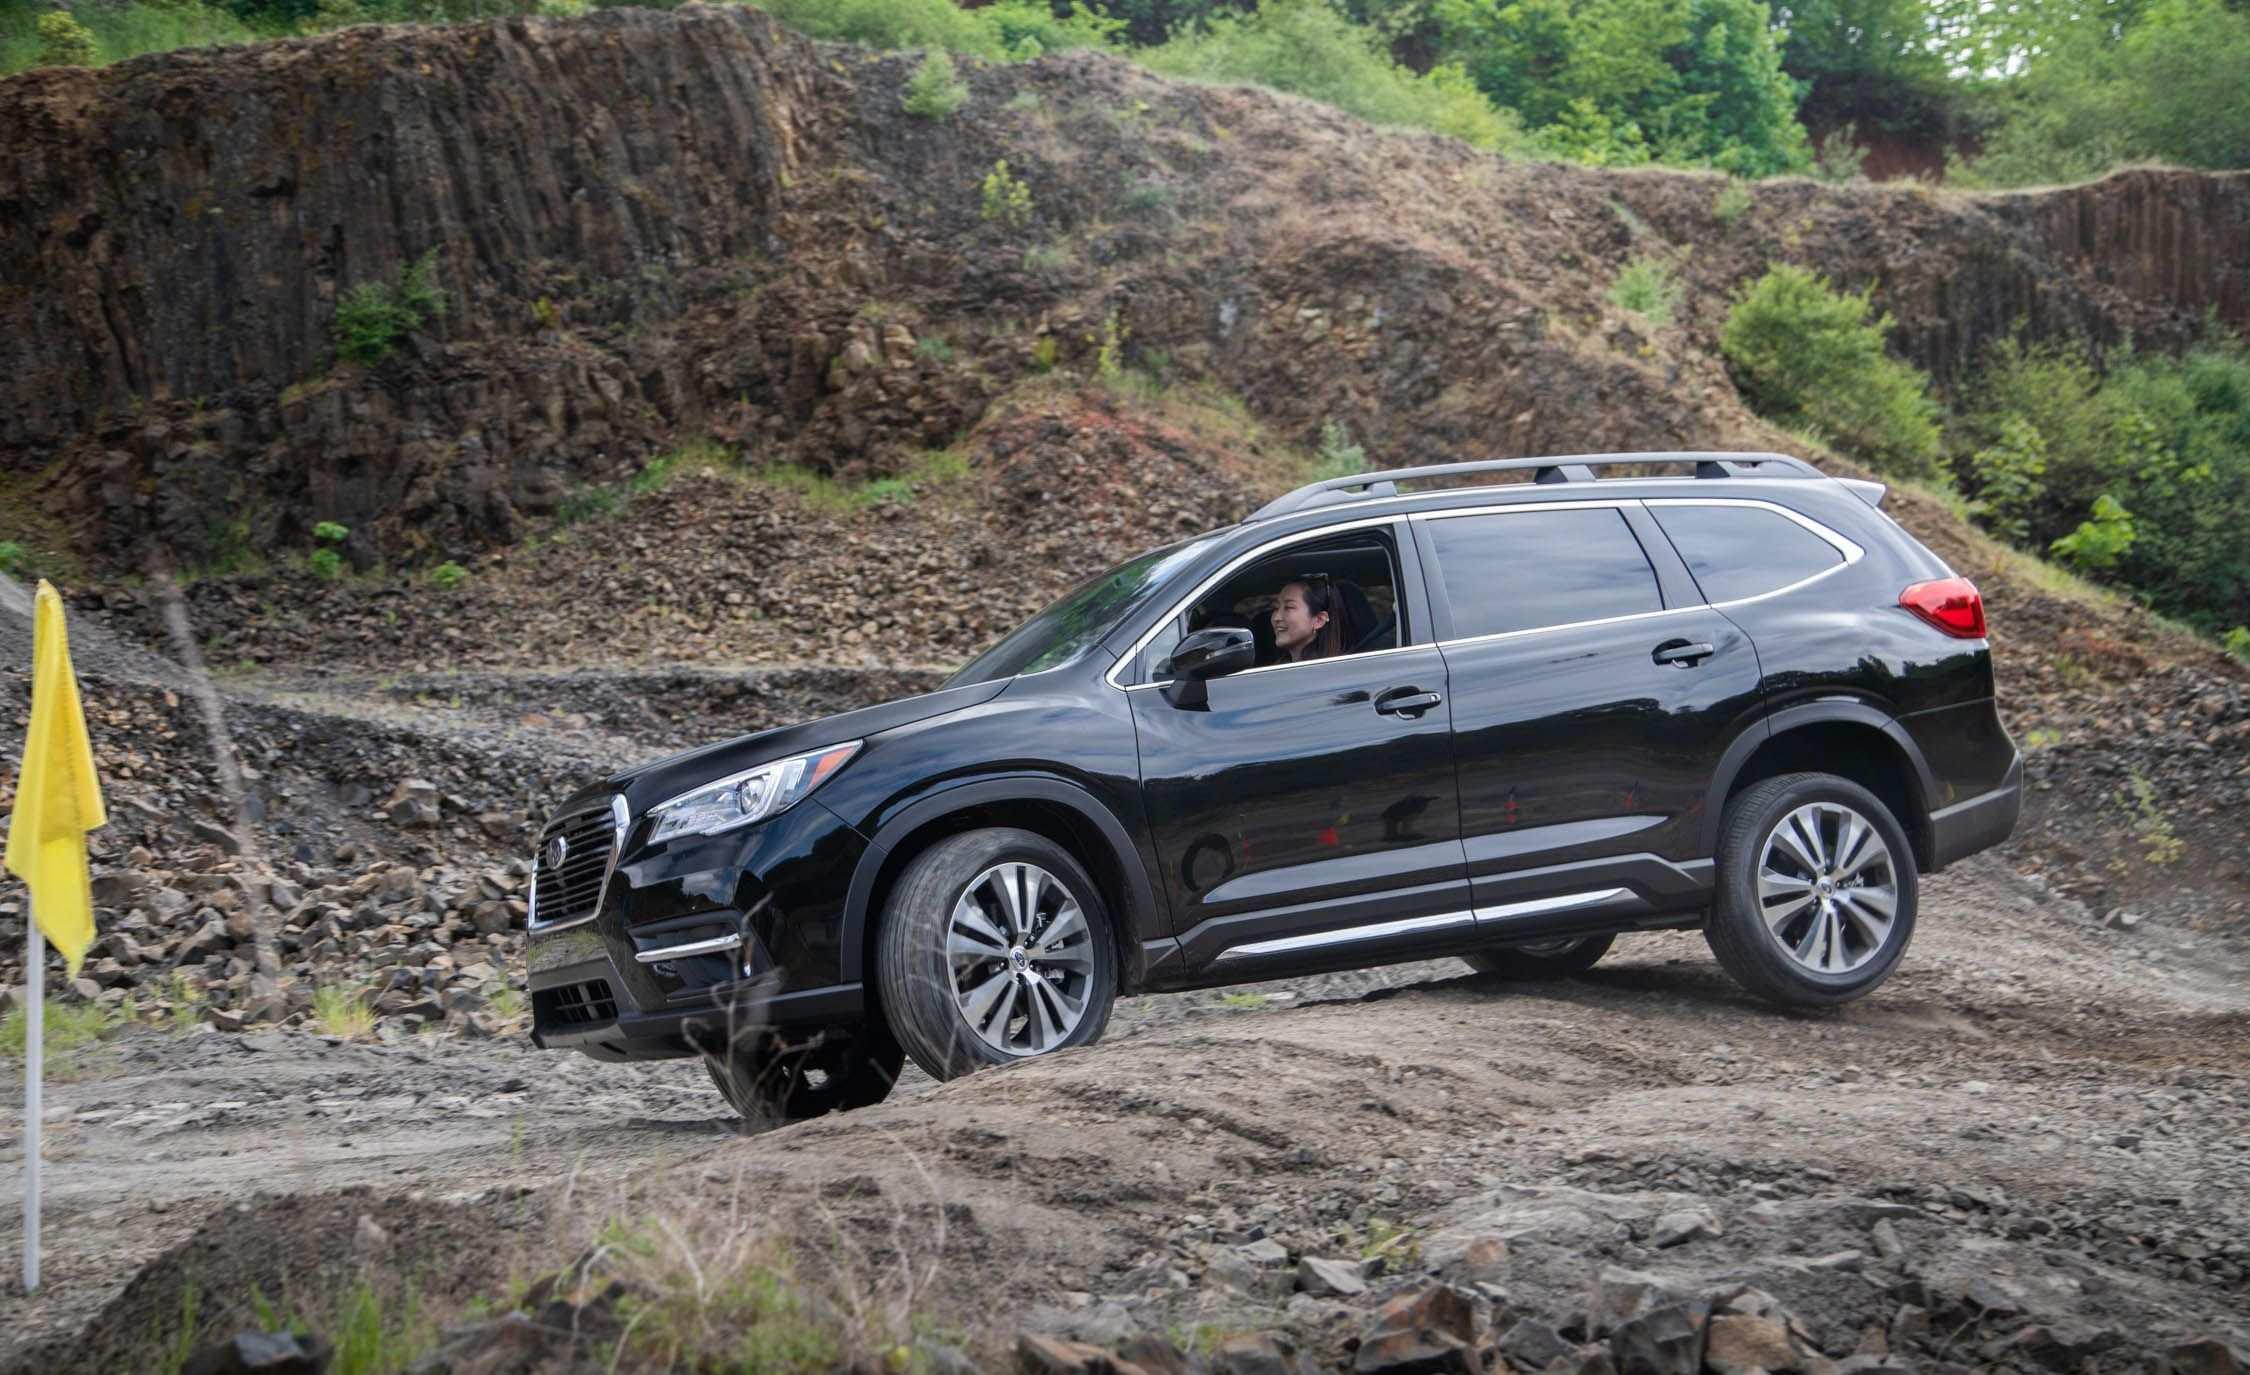 53 The 2019 Subaru Ascent Gvwr Spesification with 2019 Subaru Ascent Gvwr